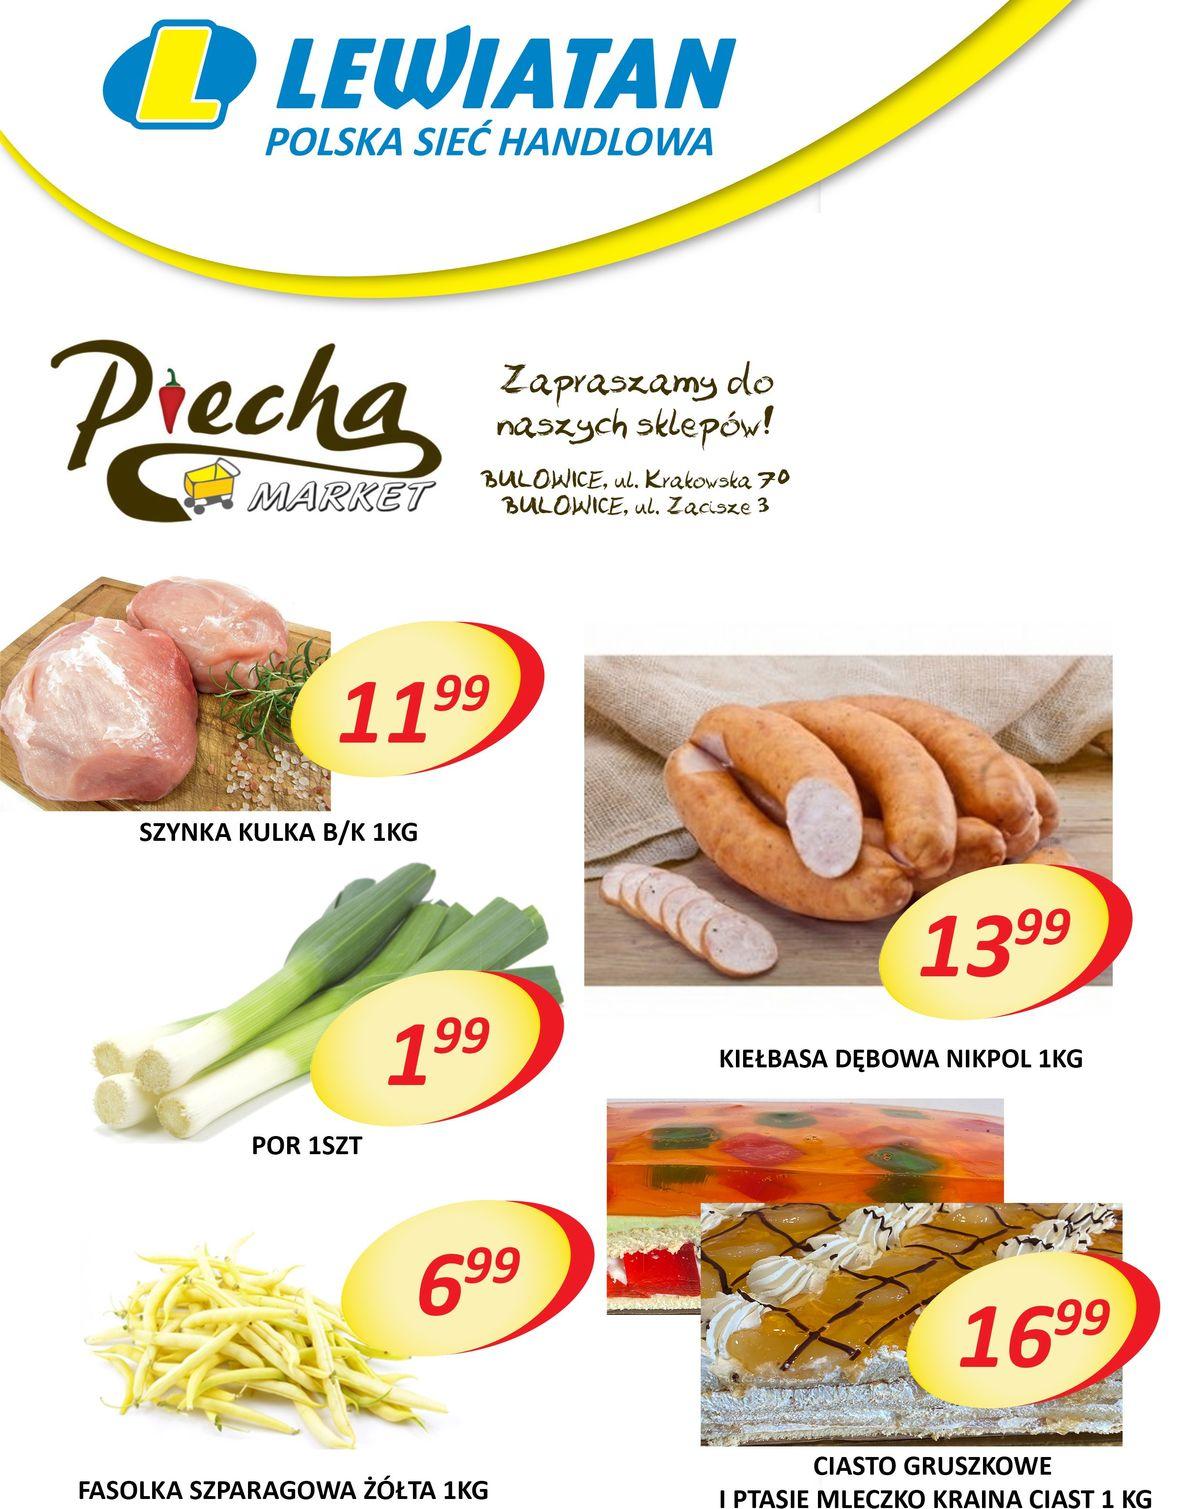 Lewiatan Piecha Market w Bulowicach. Gazetka 16-18 lipca